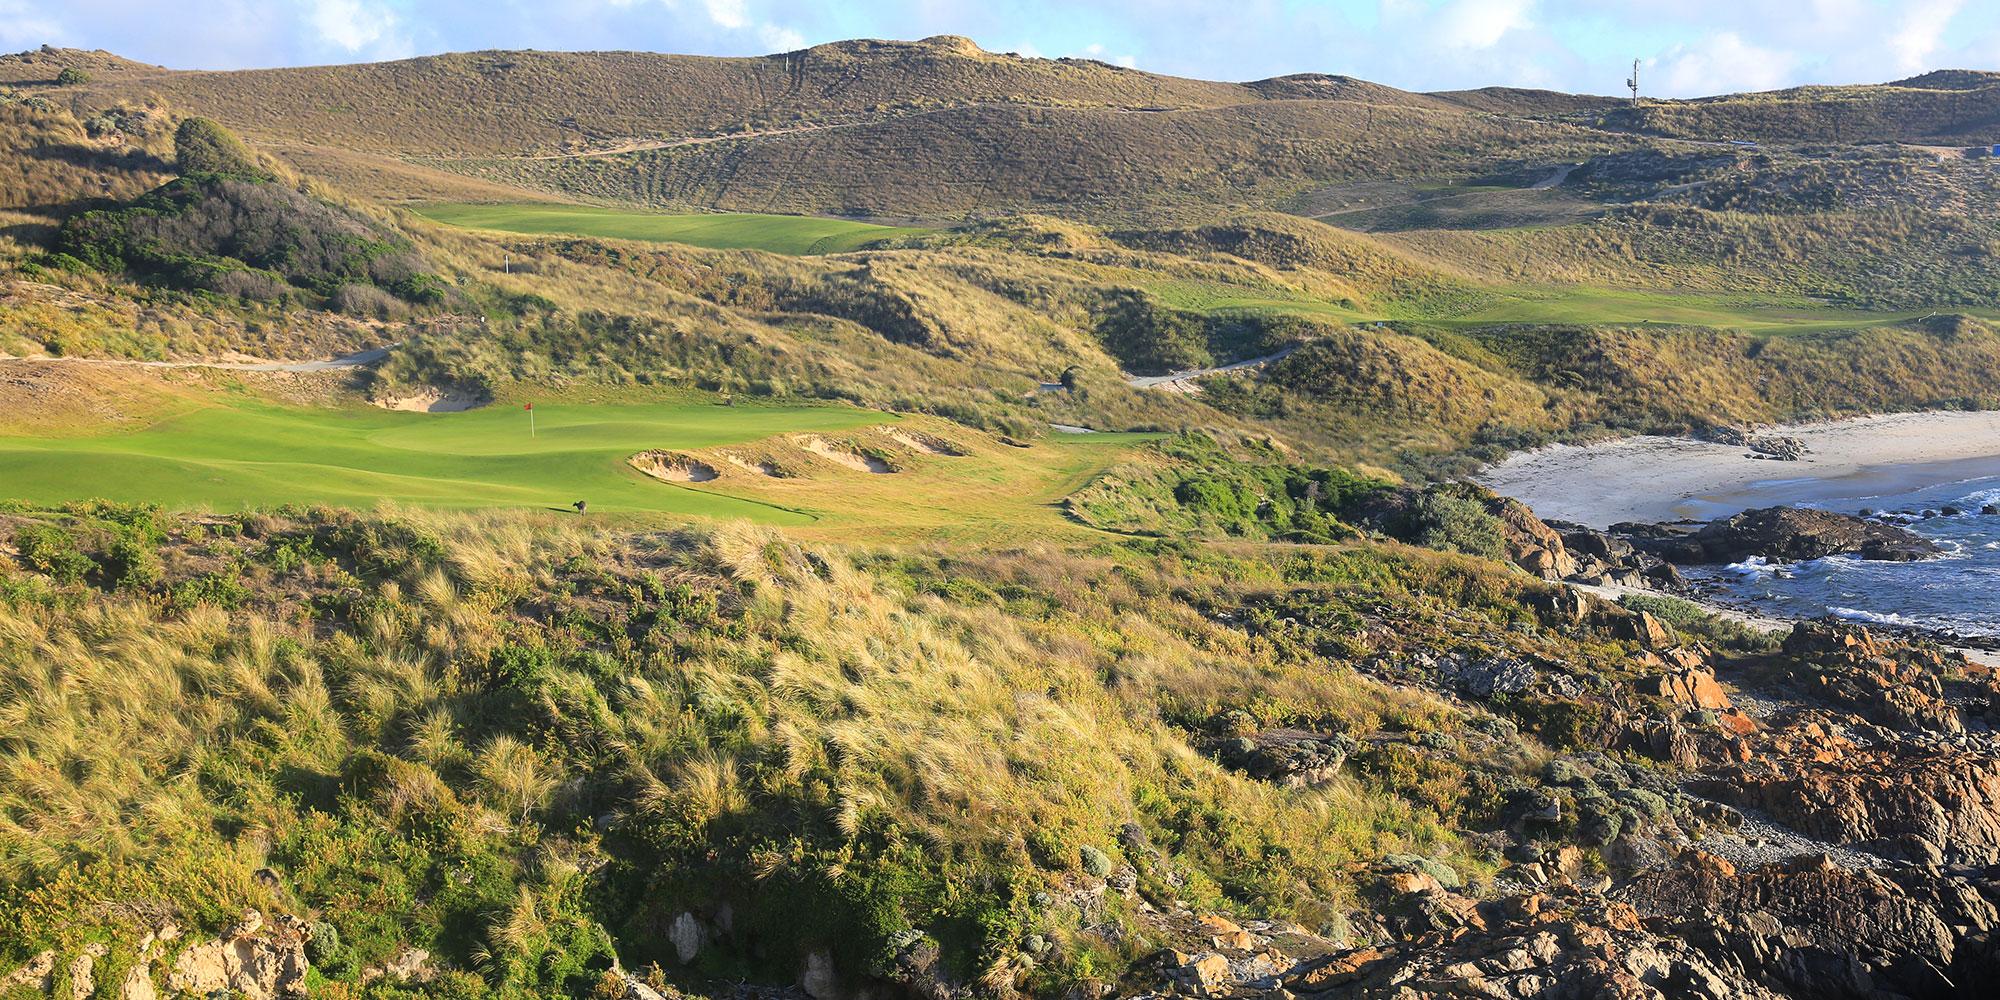 The Best Of East Coast Australian Golf | Melbourne, King Island, Tasmania and Sydney | 12 nights, 9 games